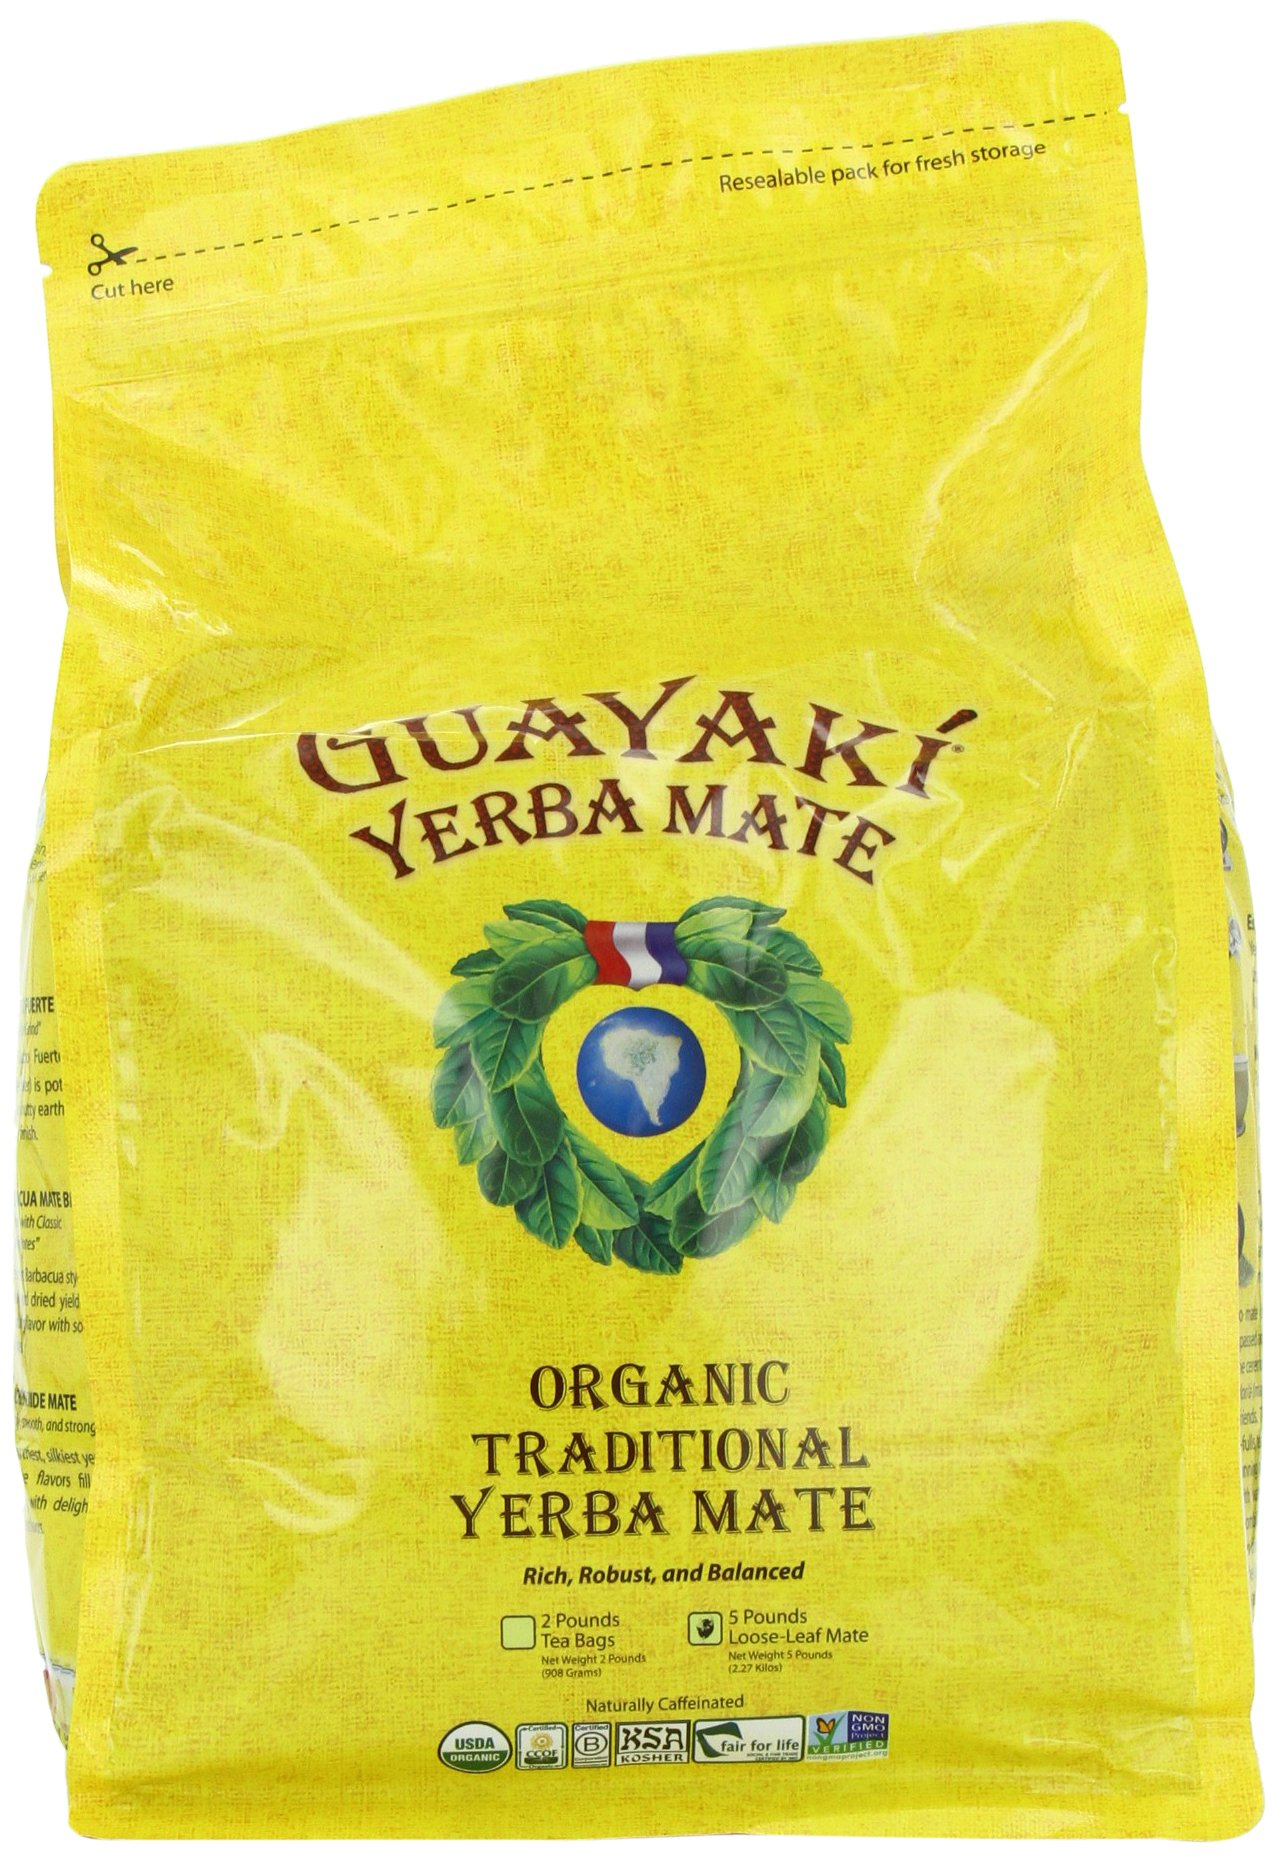 Guayaki Traditional Yerba Mate Tea, 5 Pound by Guayaki (Image #1)